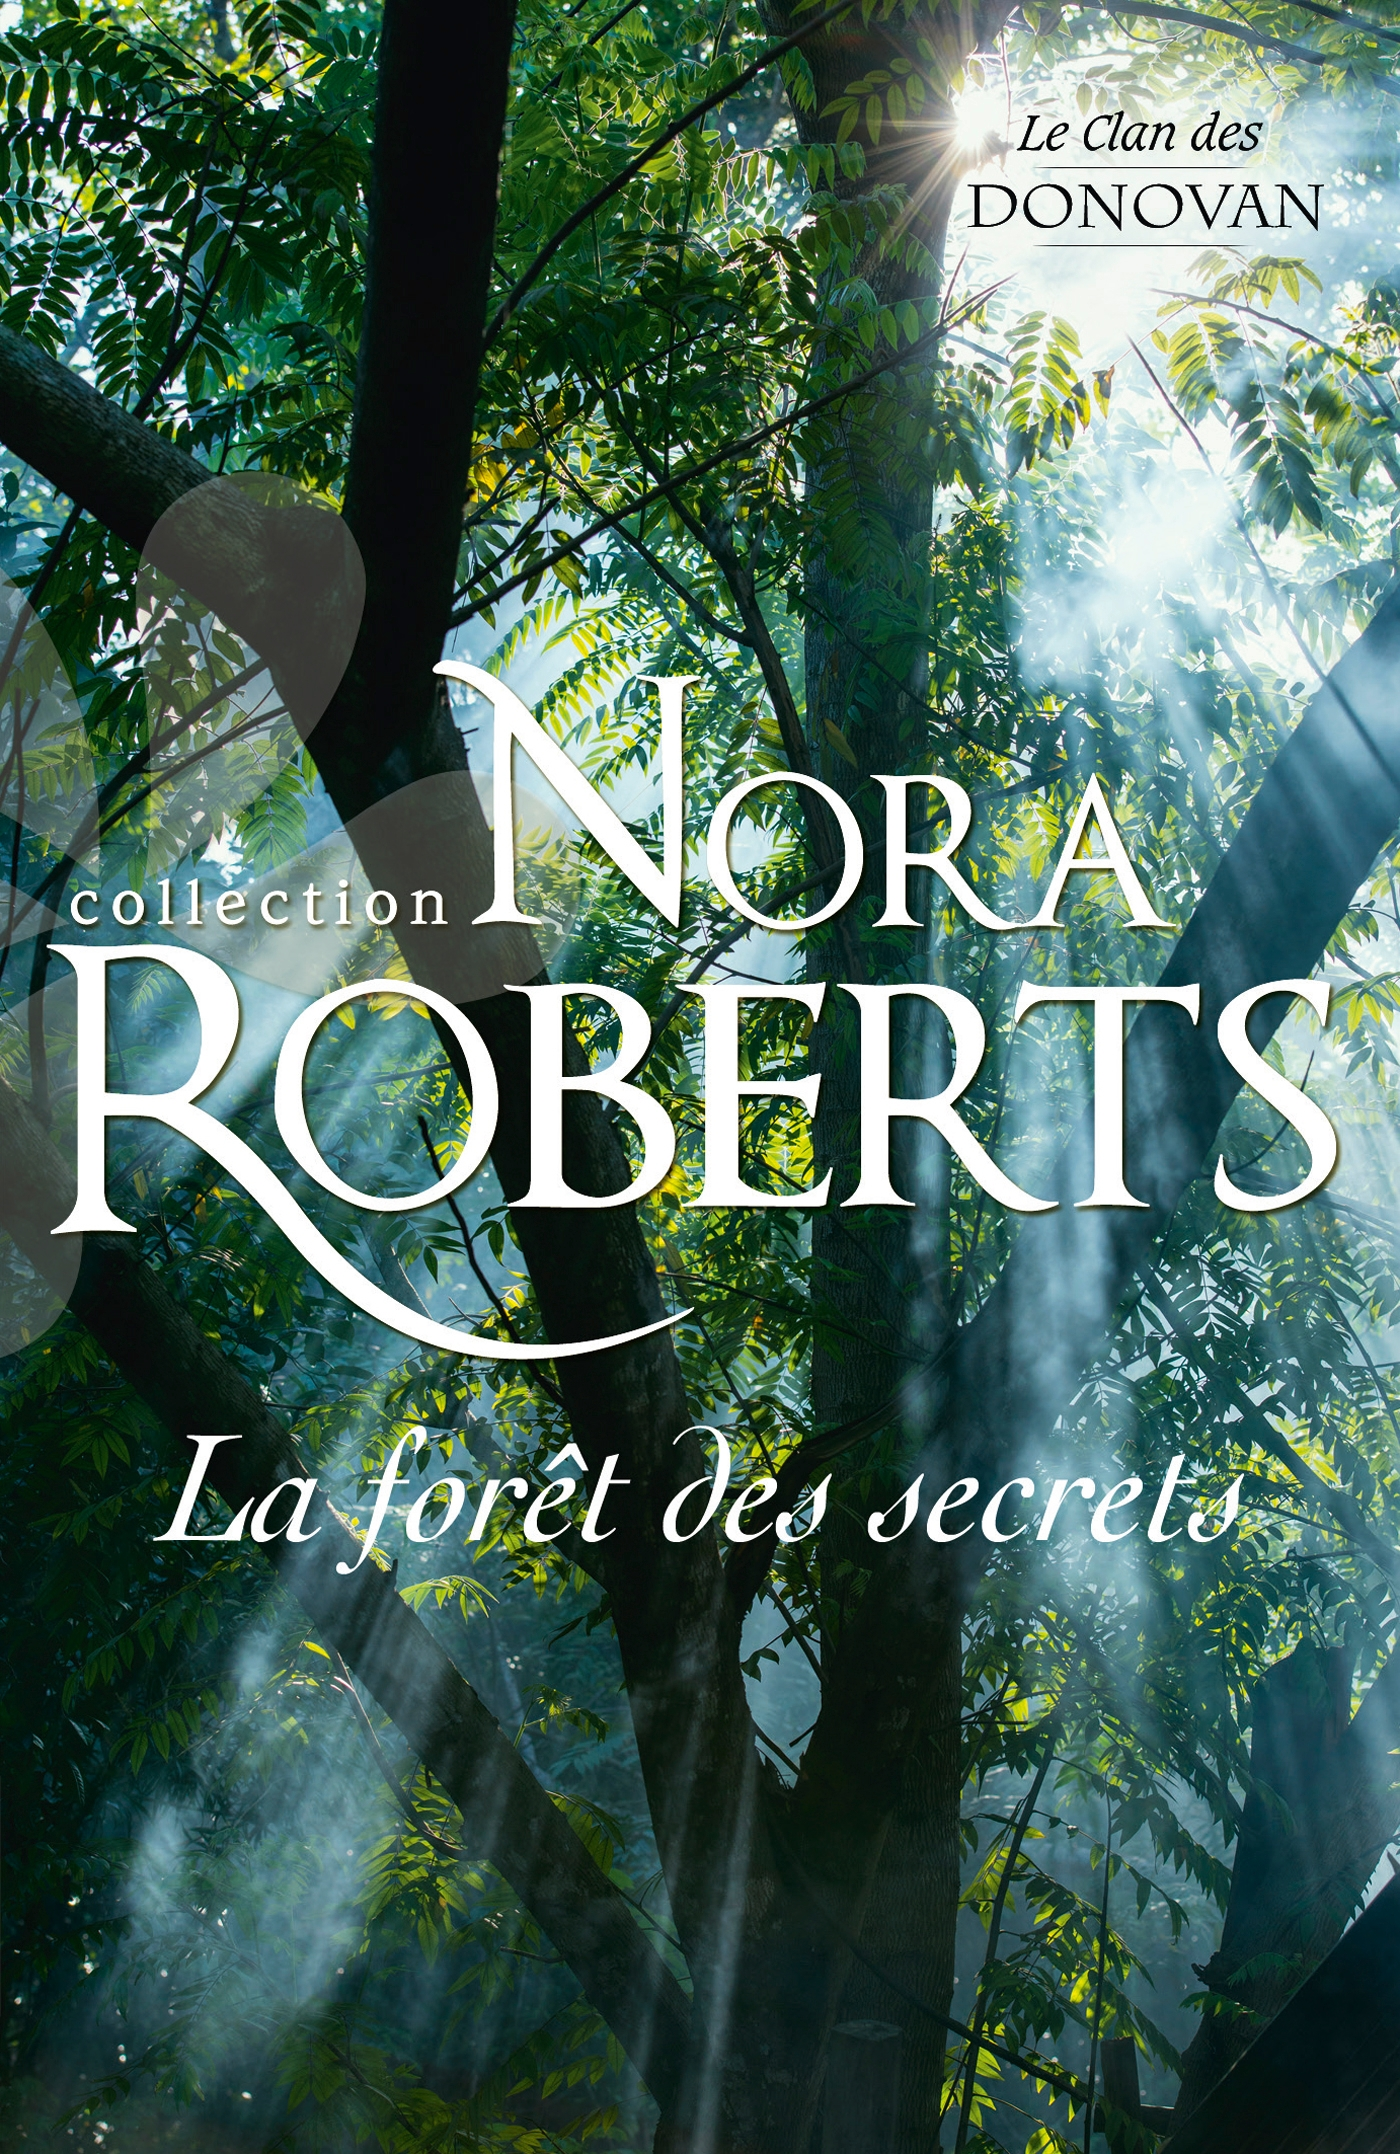 Harlequin la for t des secrets - Coup de coeur nora roberts ...